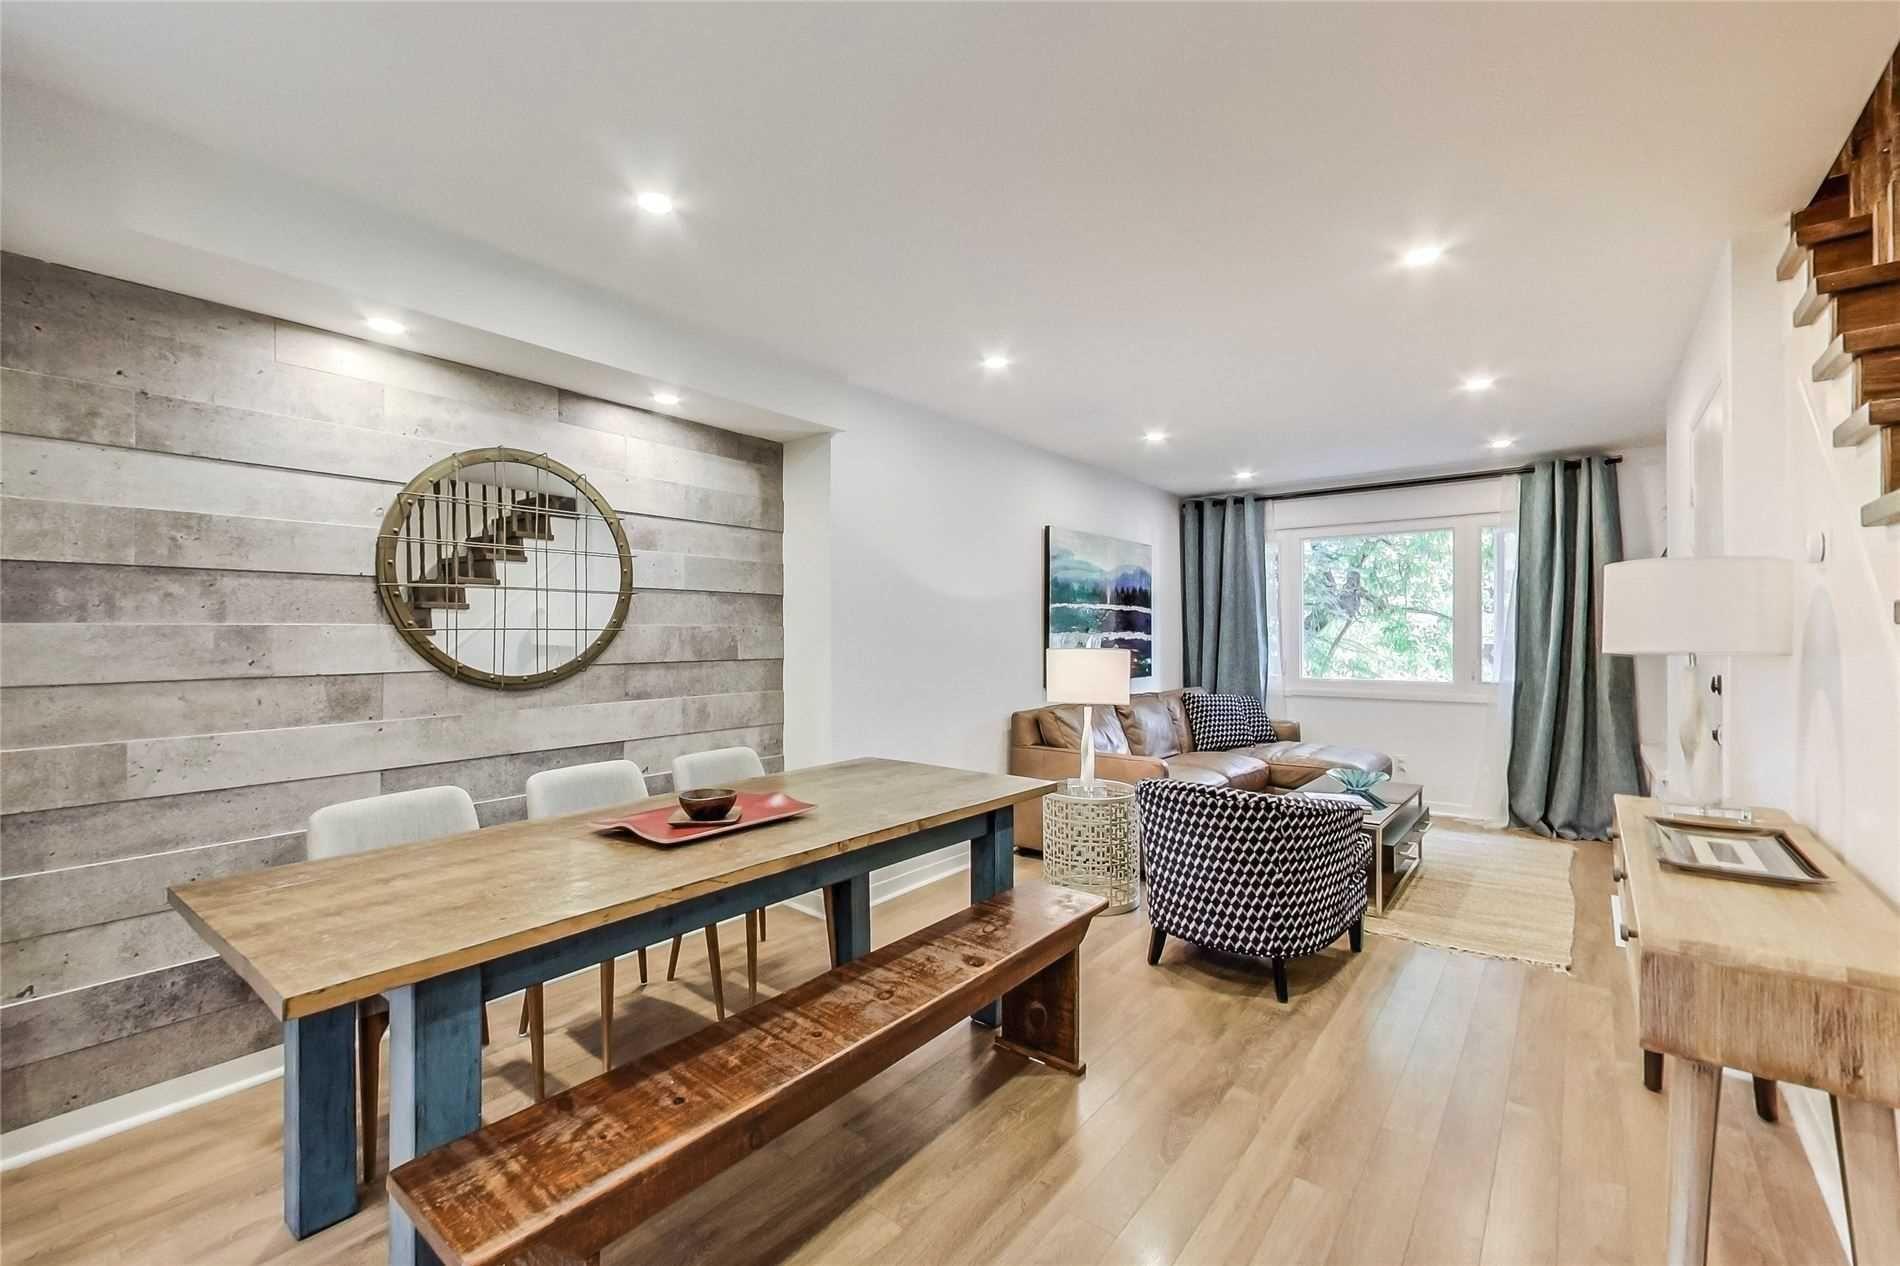 Main Photo: 19 Sydenham Street in Toronto: Regent Park House (3-Storey) for sale (Toronto C08)  : MLS®# C5152913